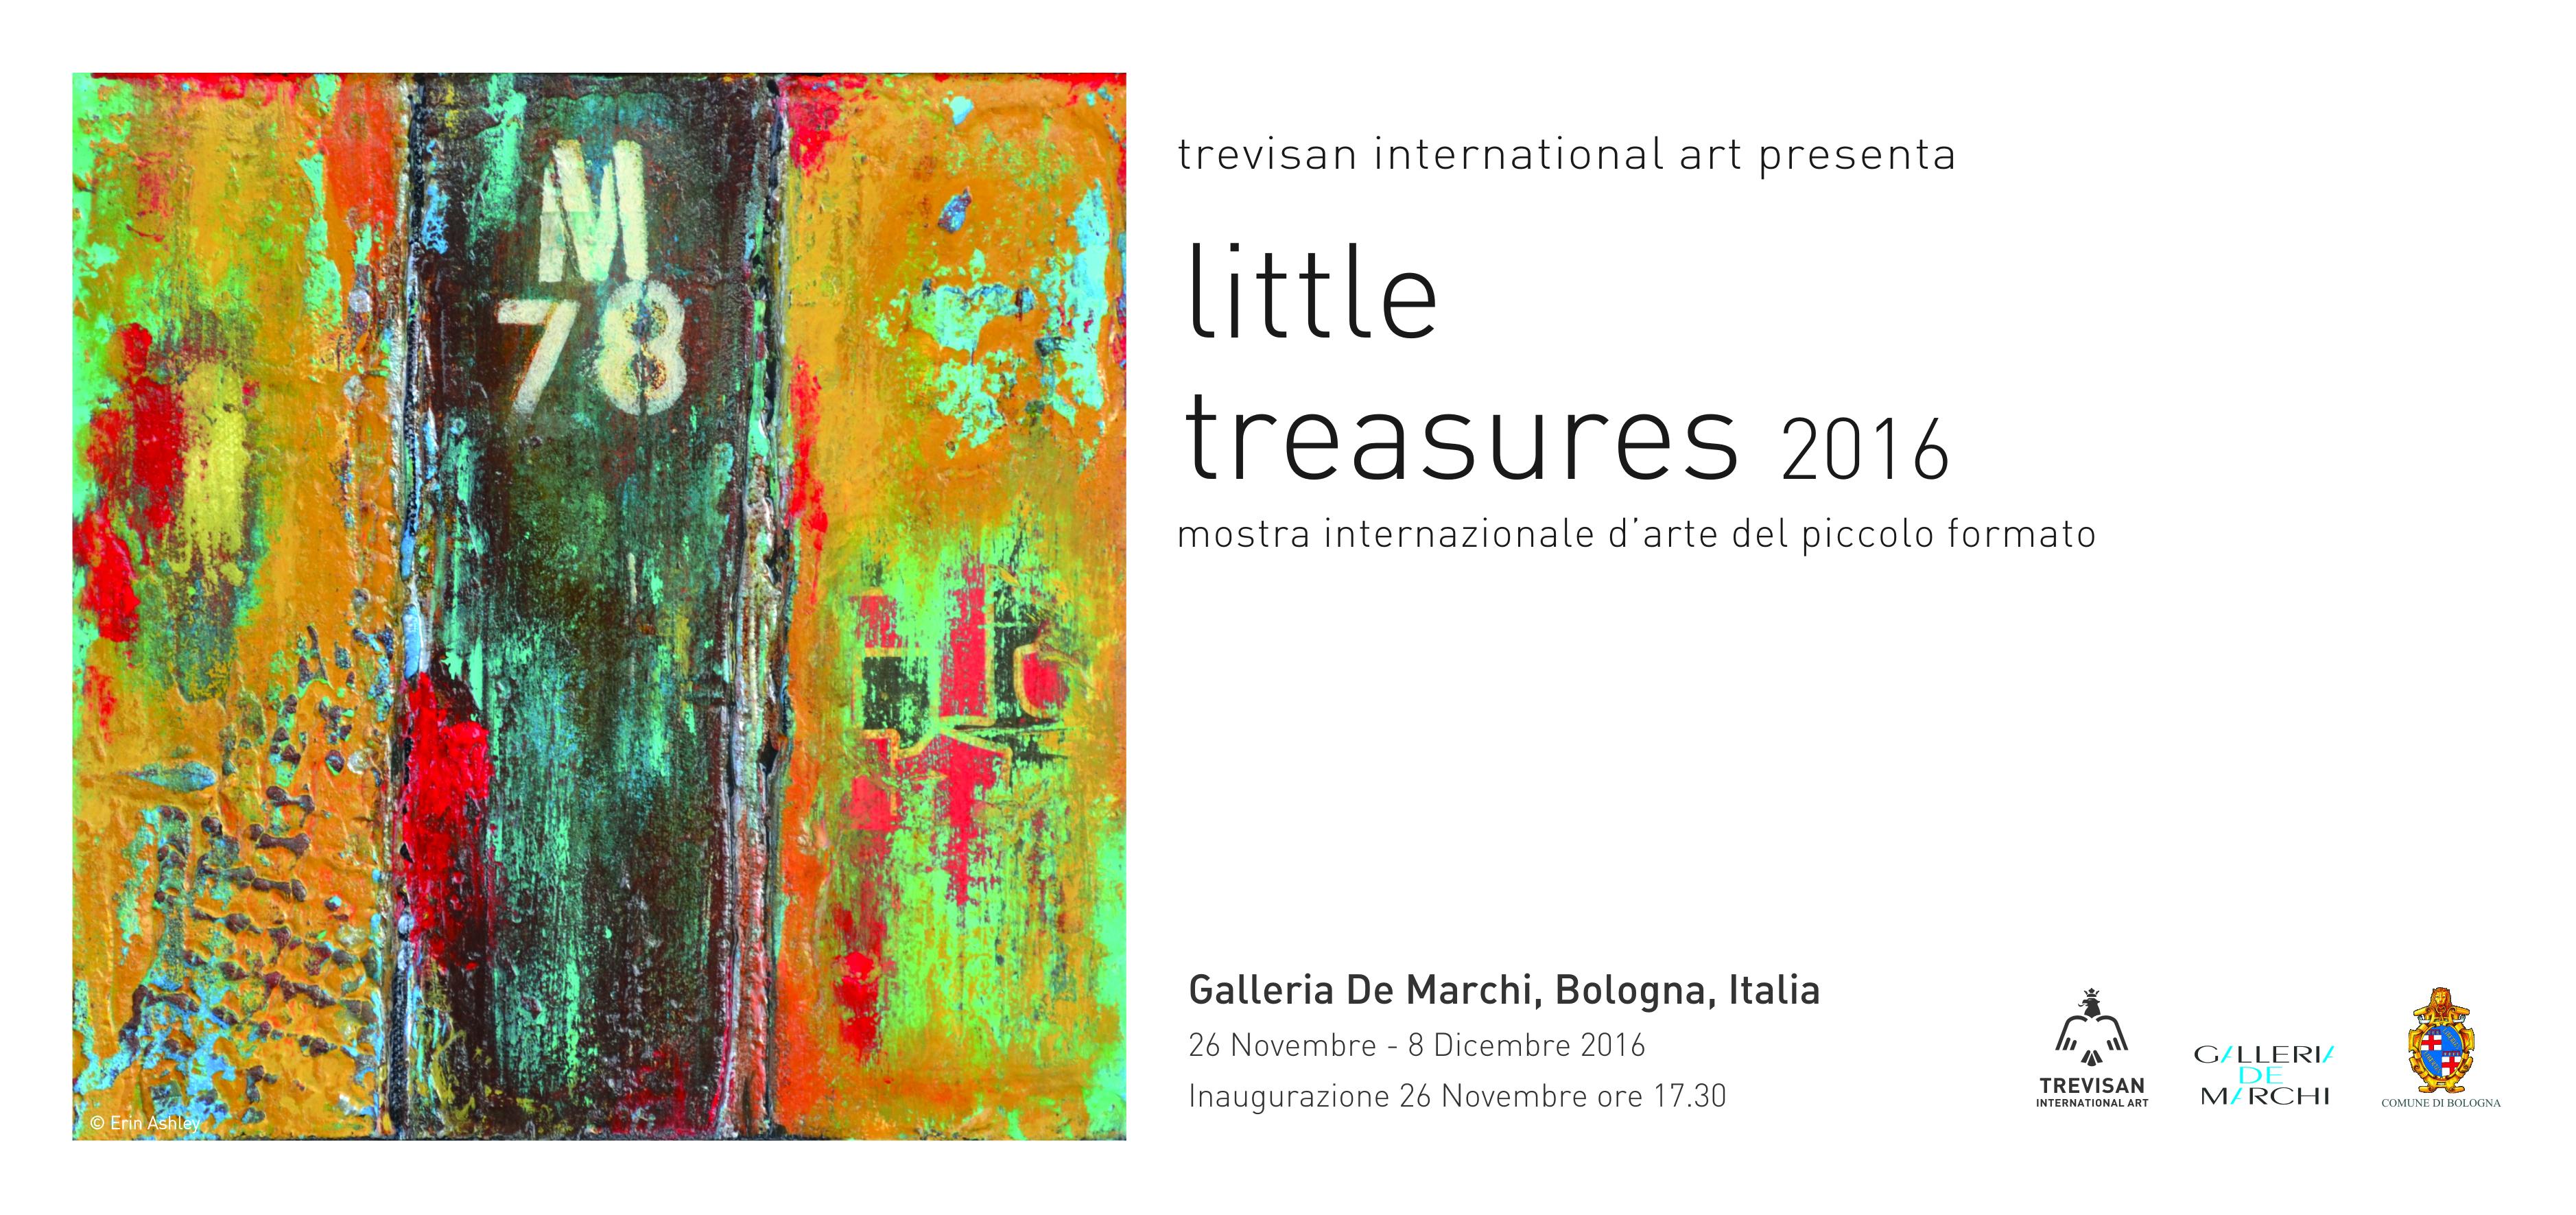 Exhibiting with Trevisan International Art, Galleria de Marchi, Bologna. 26th November - 8th December 2016, Private View Saturday 26th November 2016.